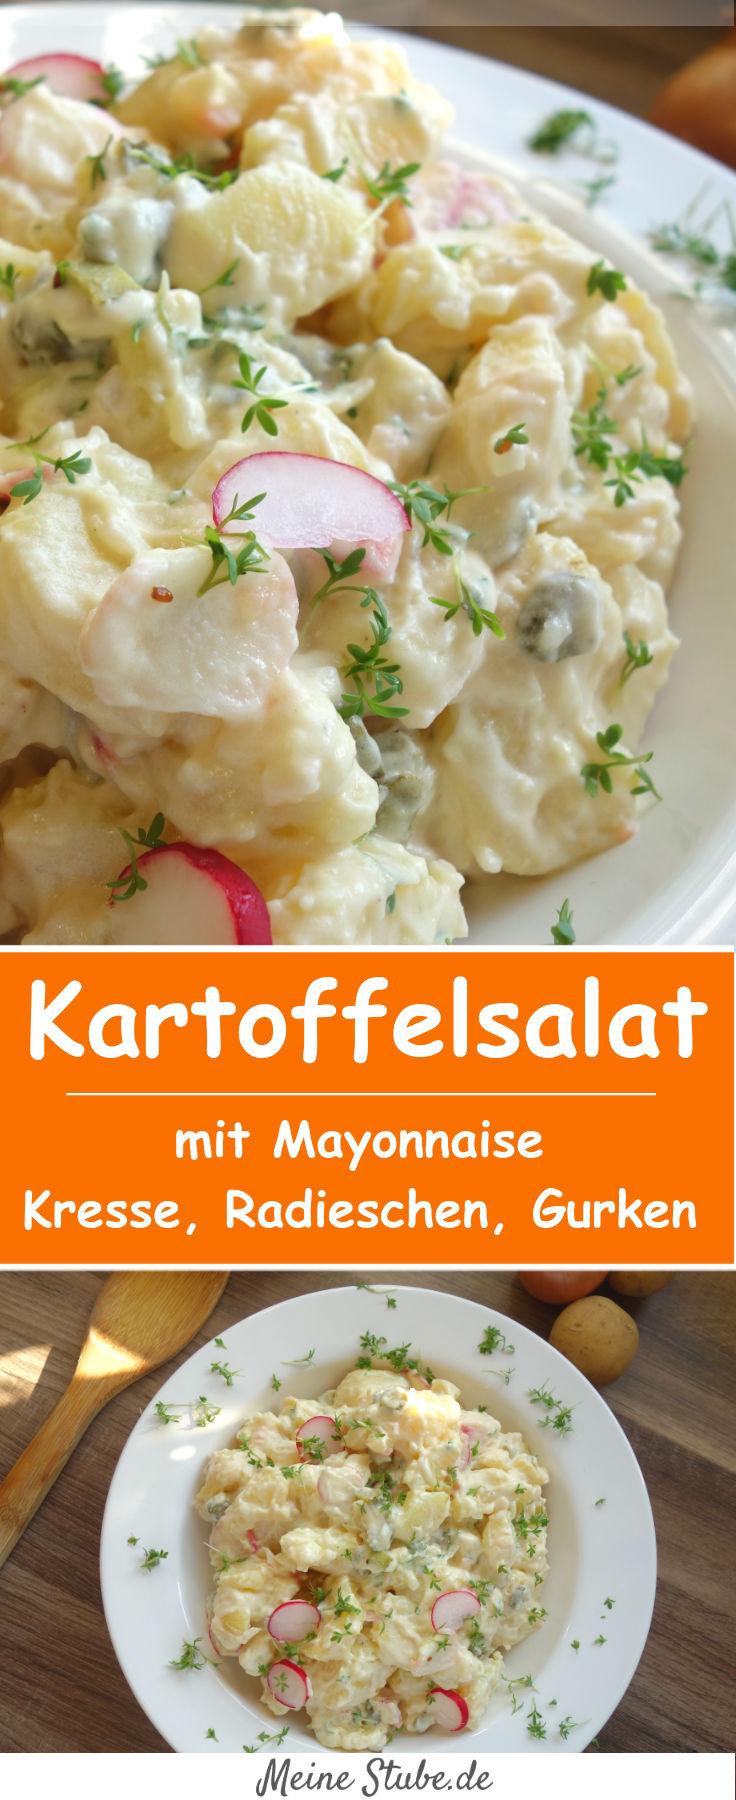 kartoffelsalat-kresse-mayonnaise